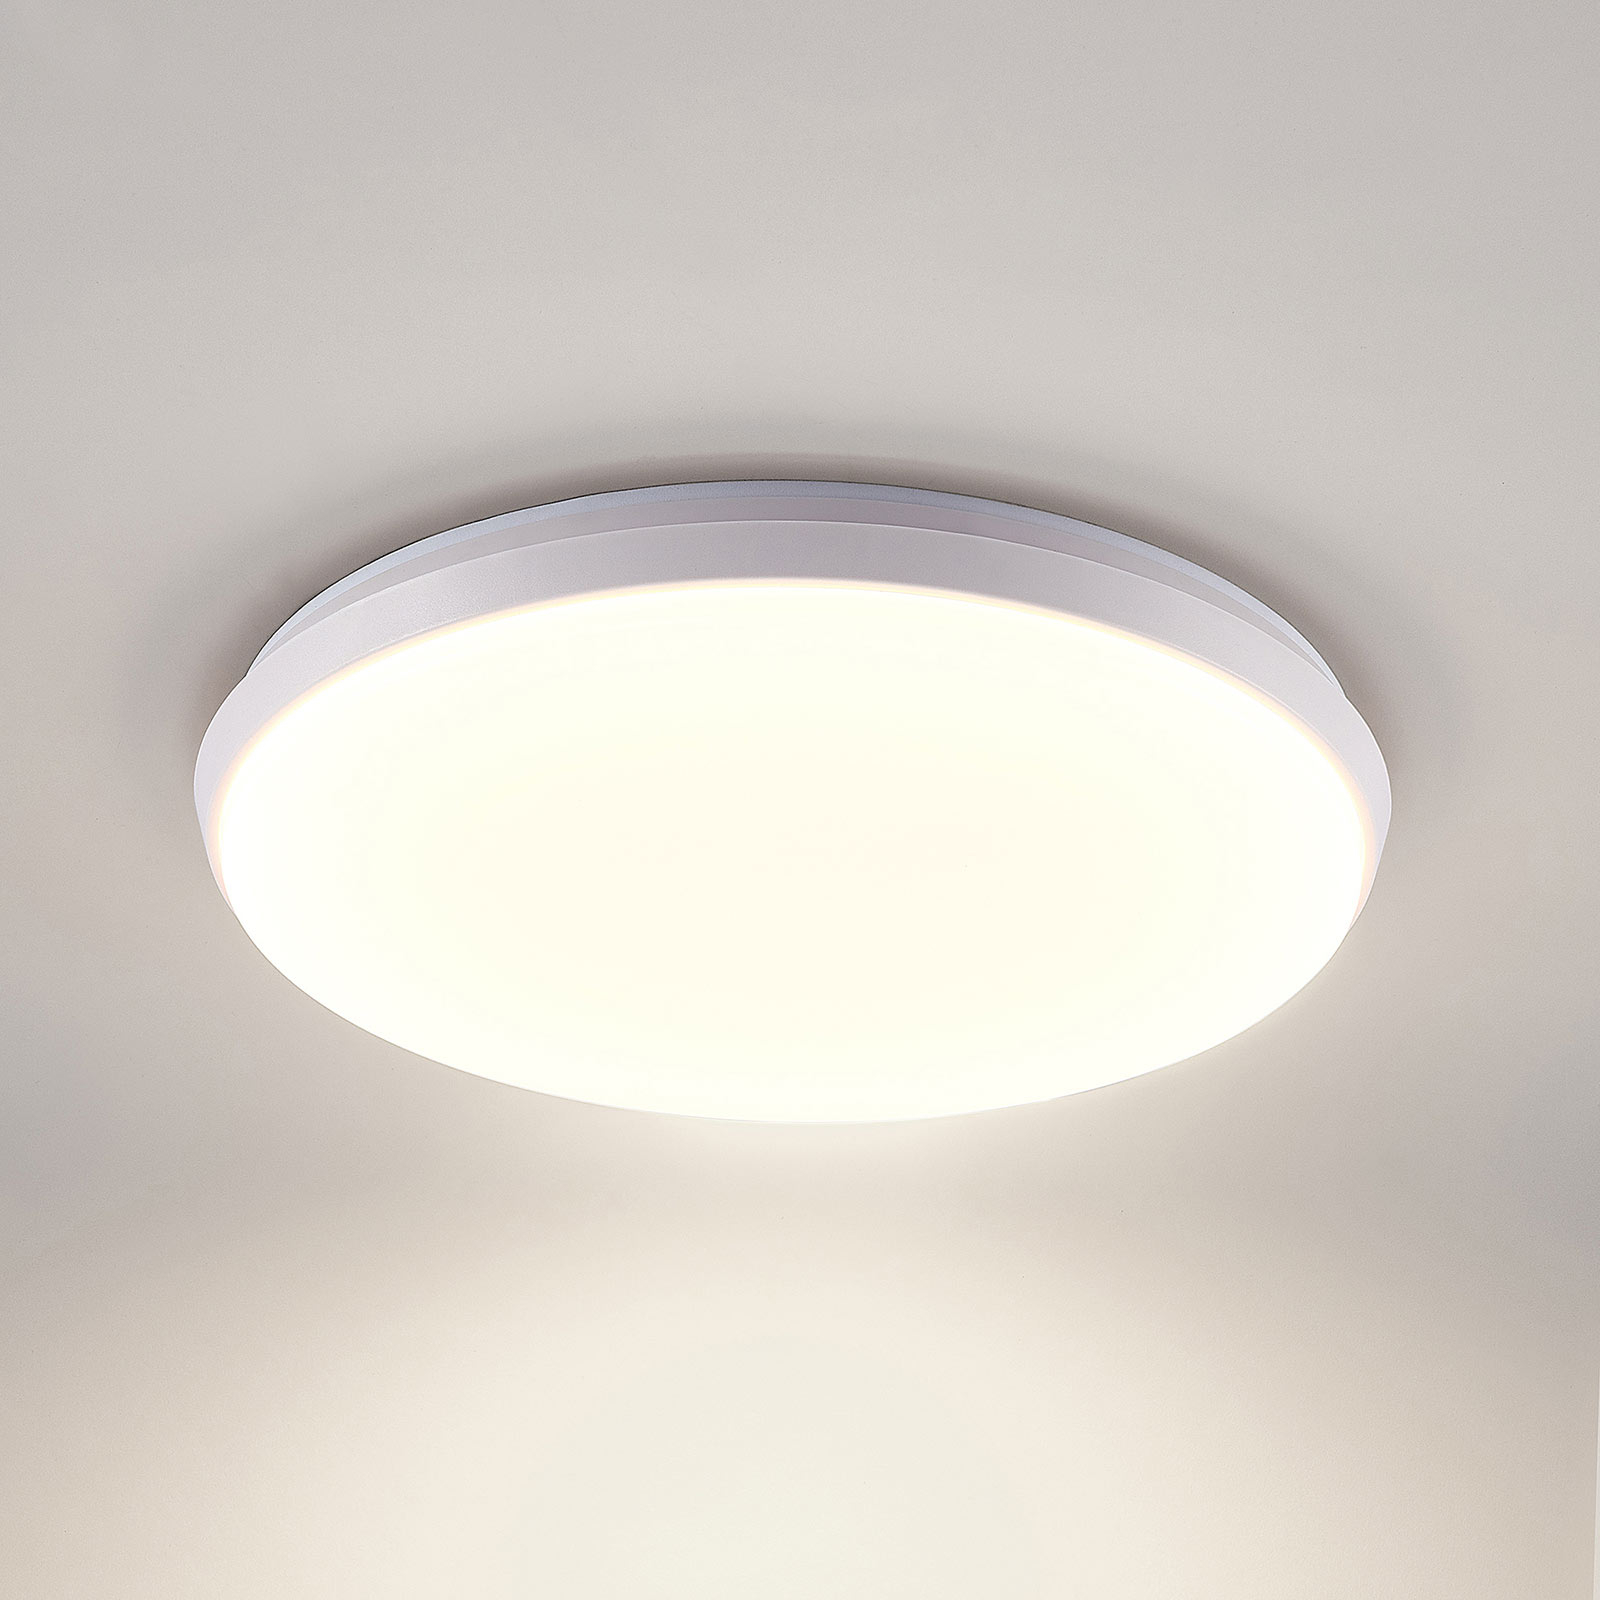 Arcchio Brady LED-loftlampe, hvid, rund, 40 cm